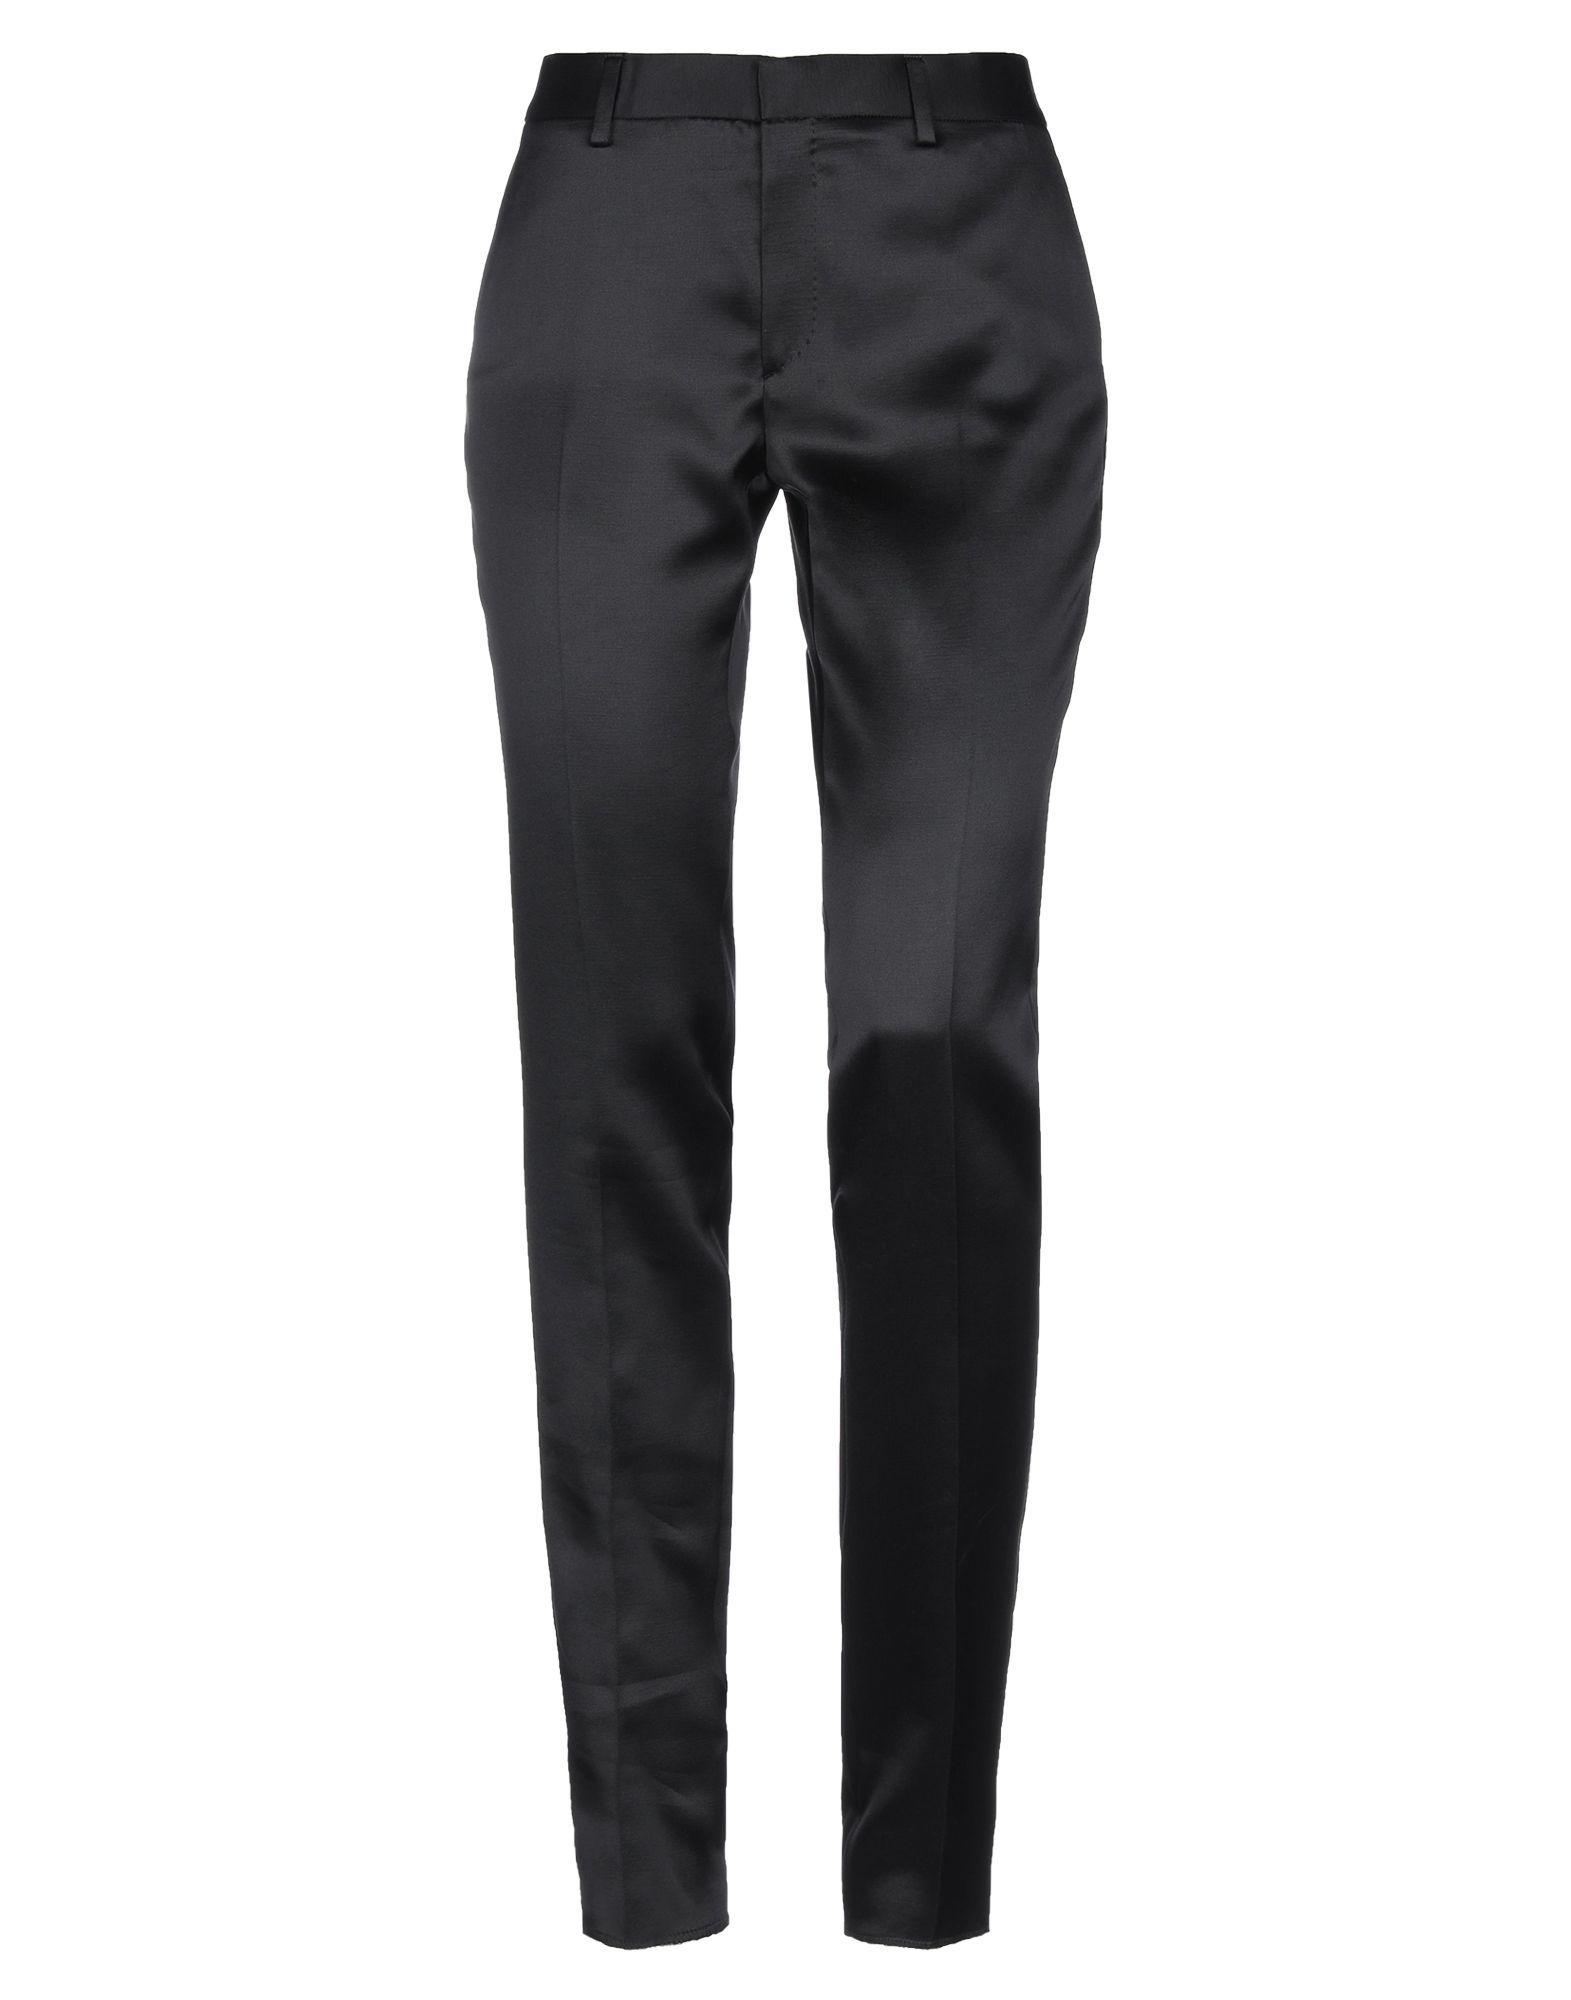 Saint Laurent Black Virgin Wool Tapered Leg Trousers